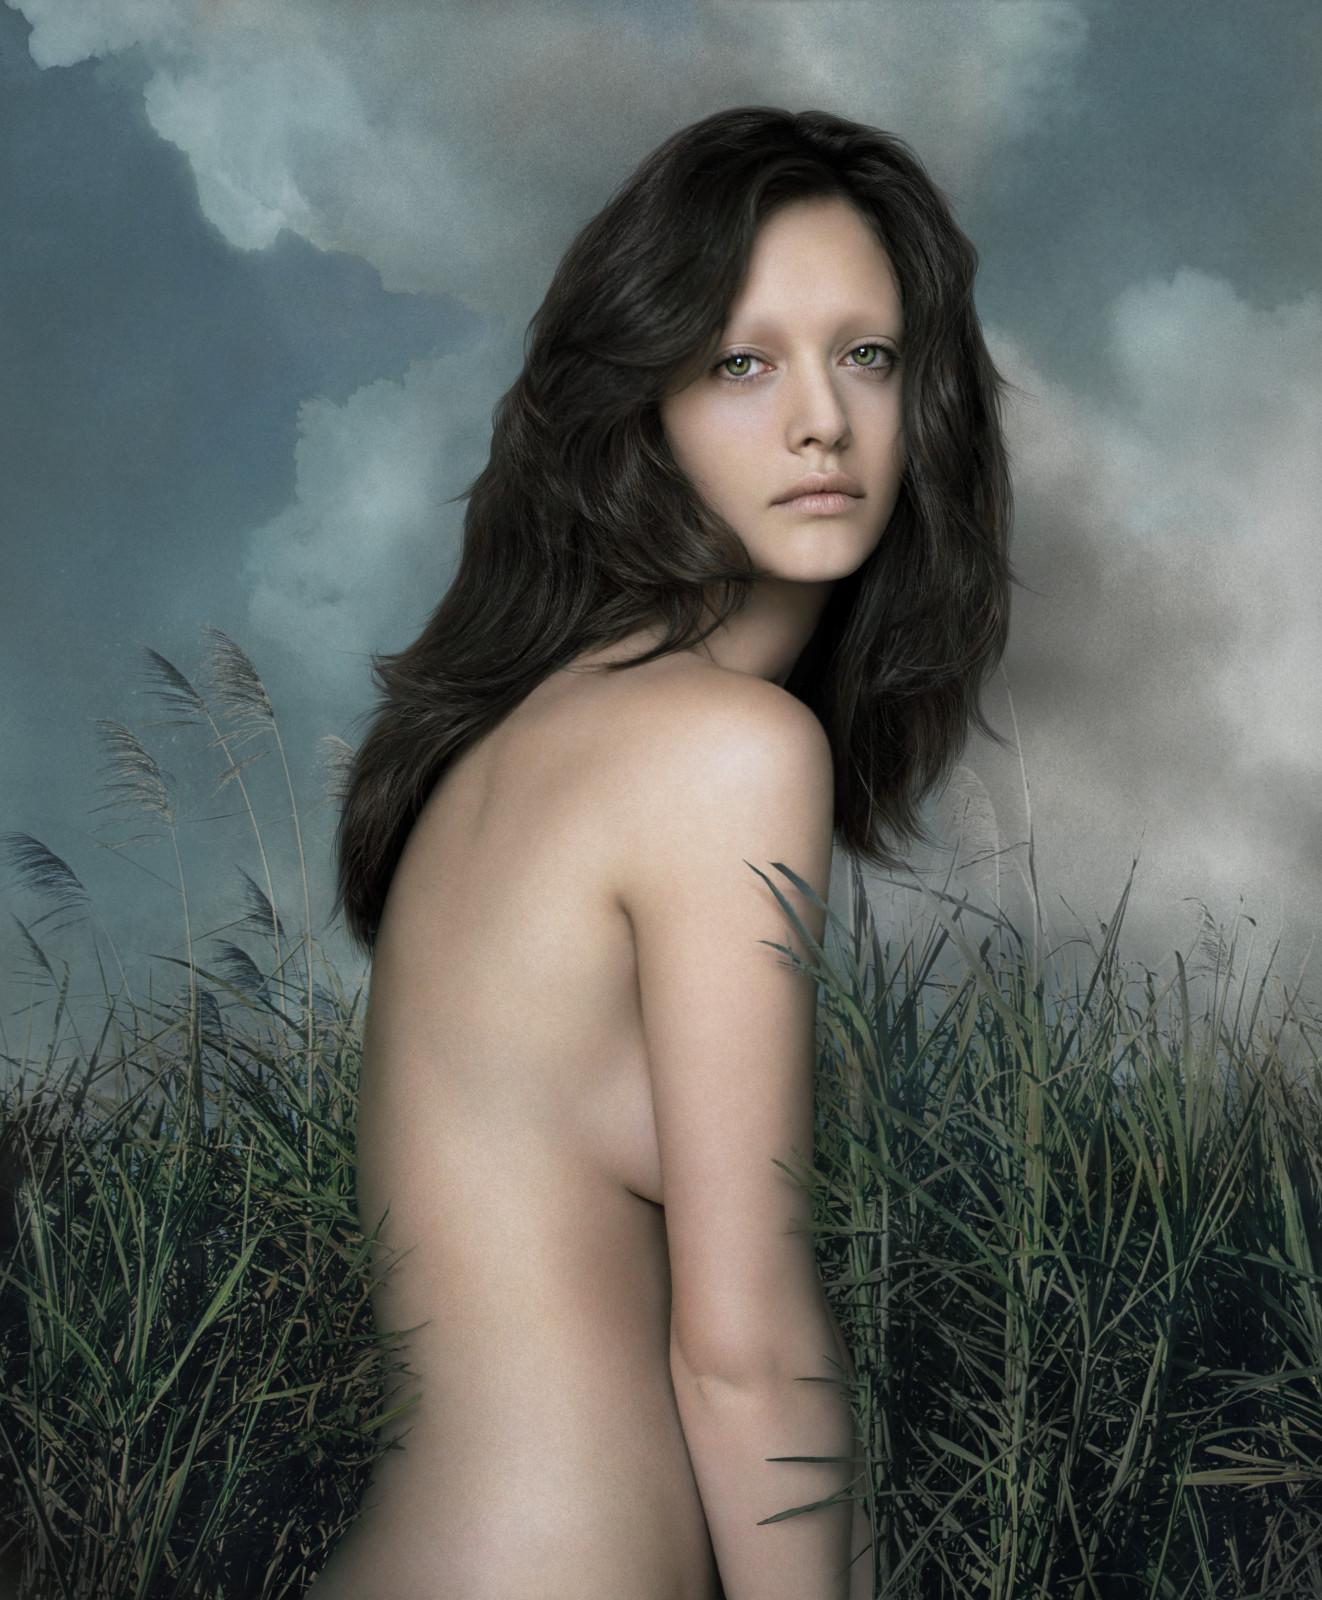 Immortal #4, Anna, 2010